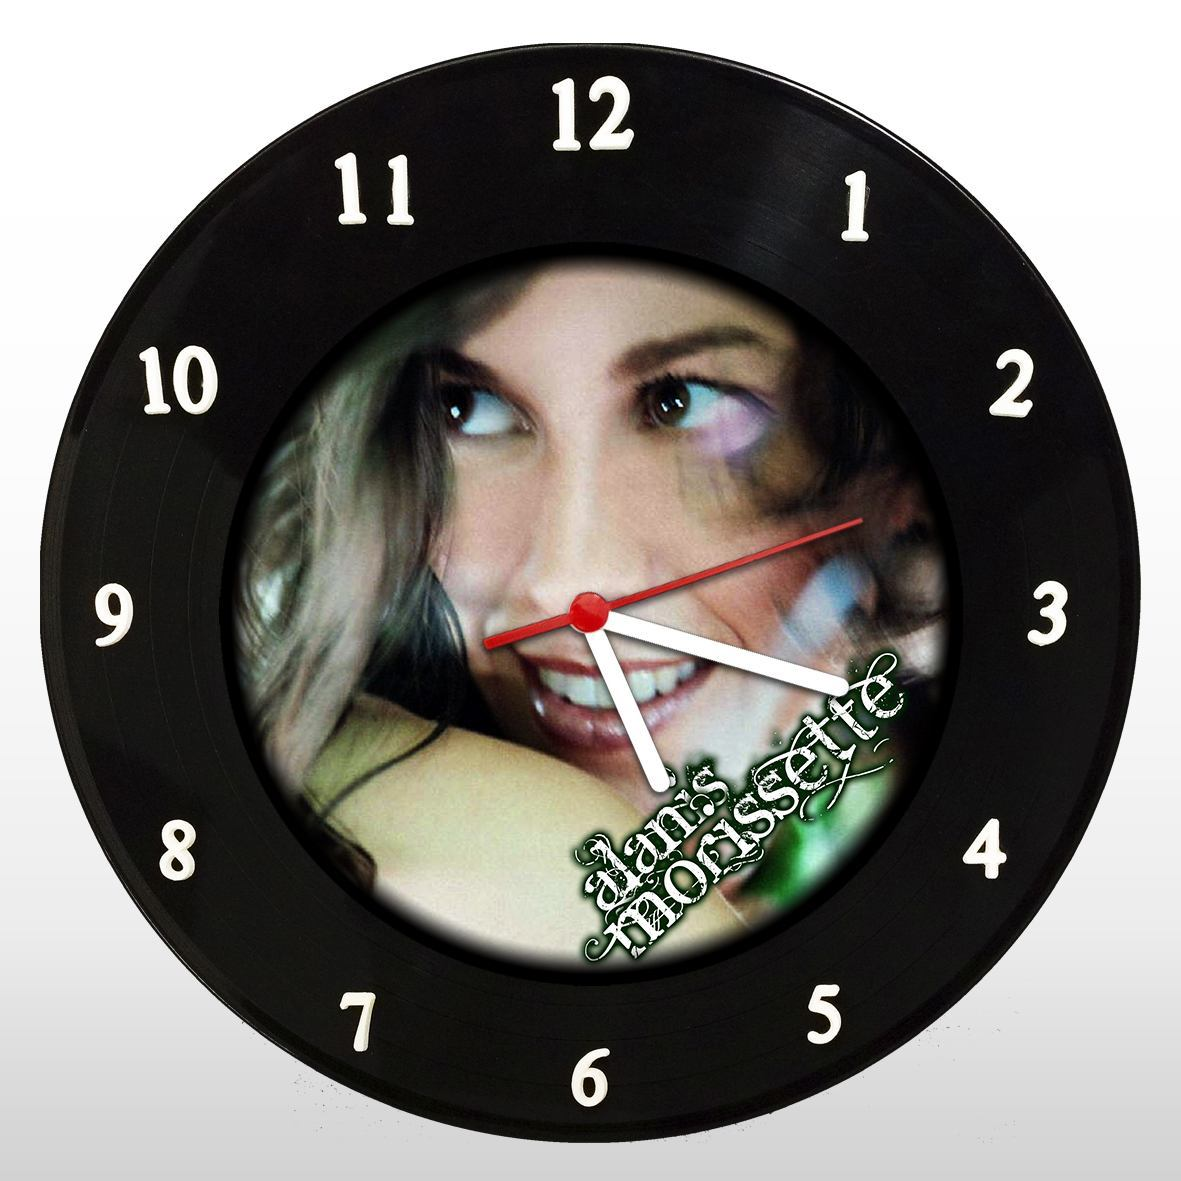 Alanis Morissette - Relógio de Parede em Disco de Vinil - Mr. Rock